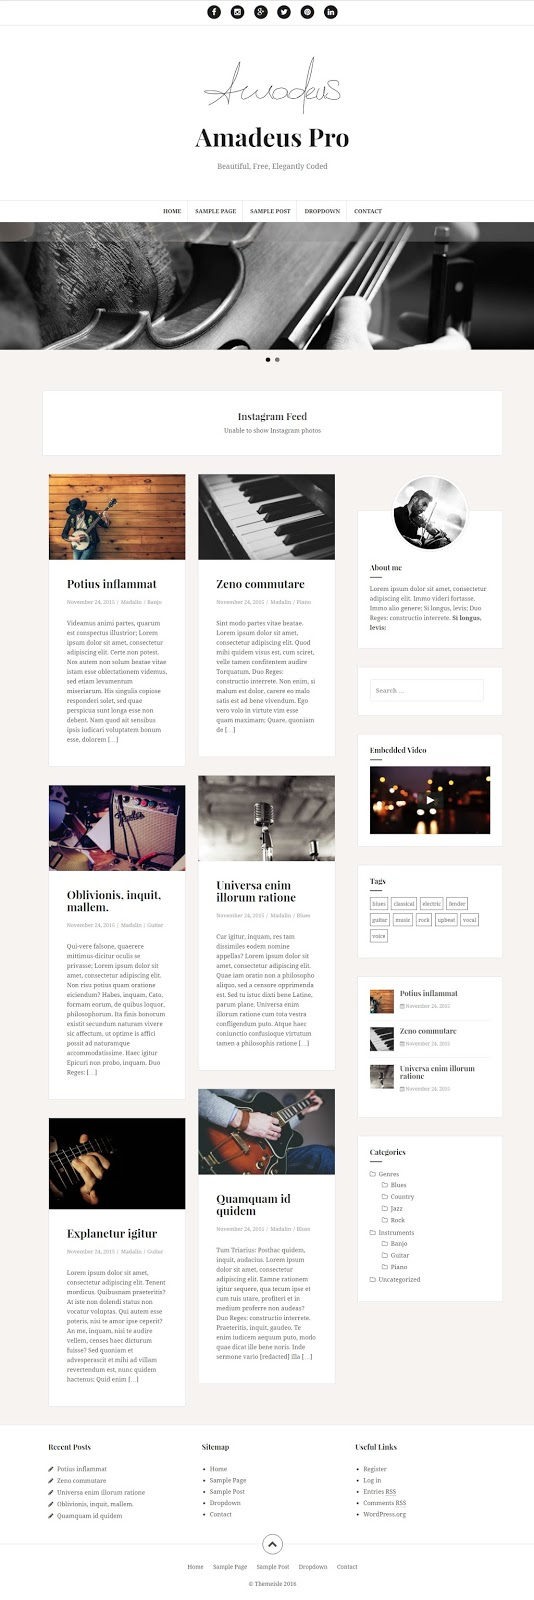 Professional Grid Based blogging Wordpress Theme